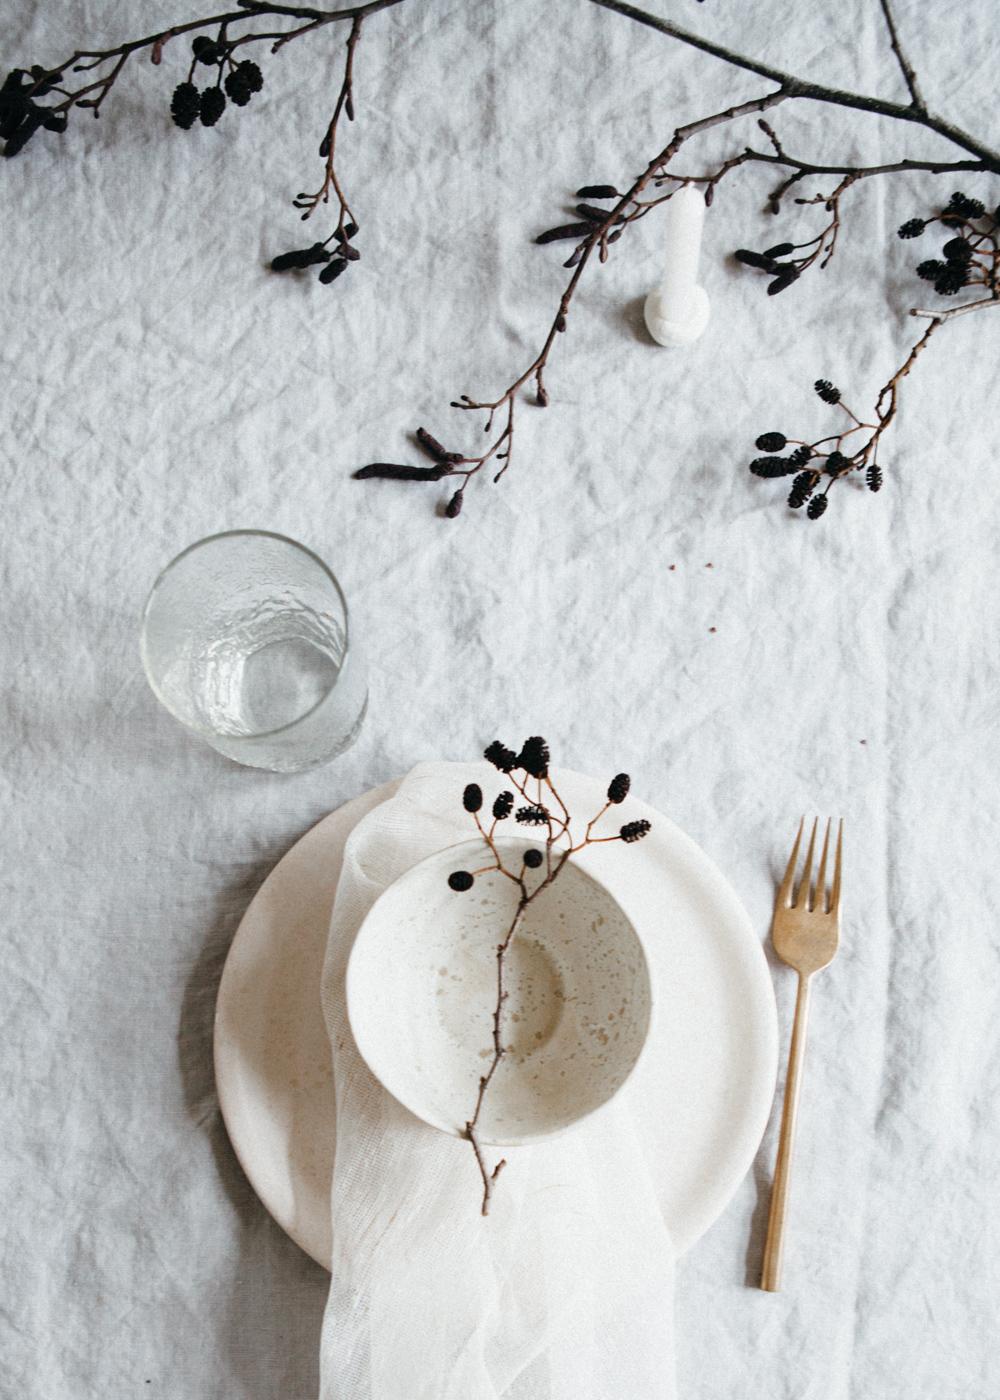 winter-tablesetting-inspire-styling-3-of-17.jpg